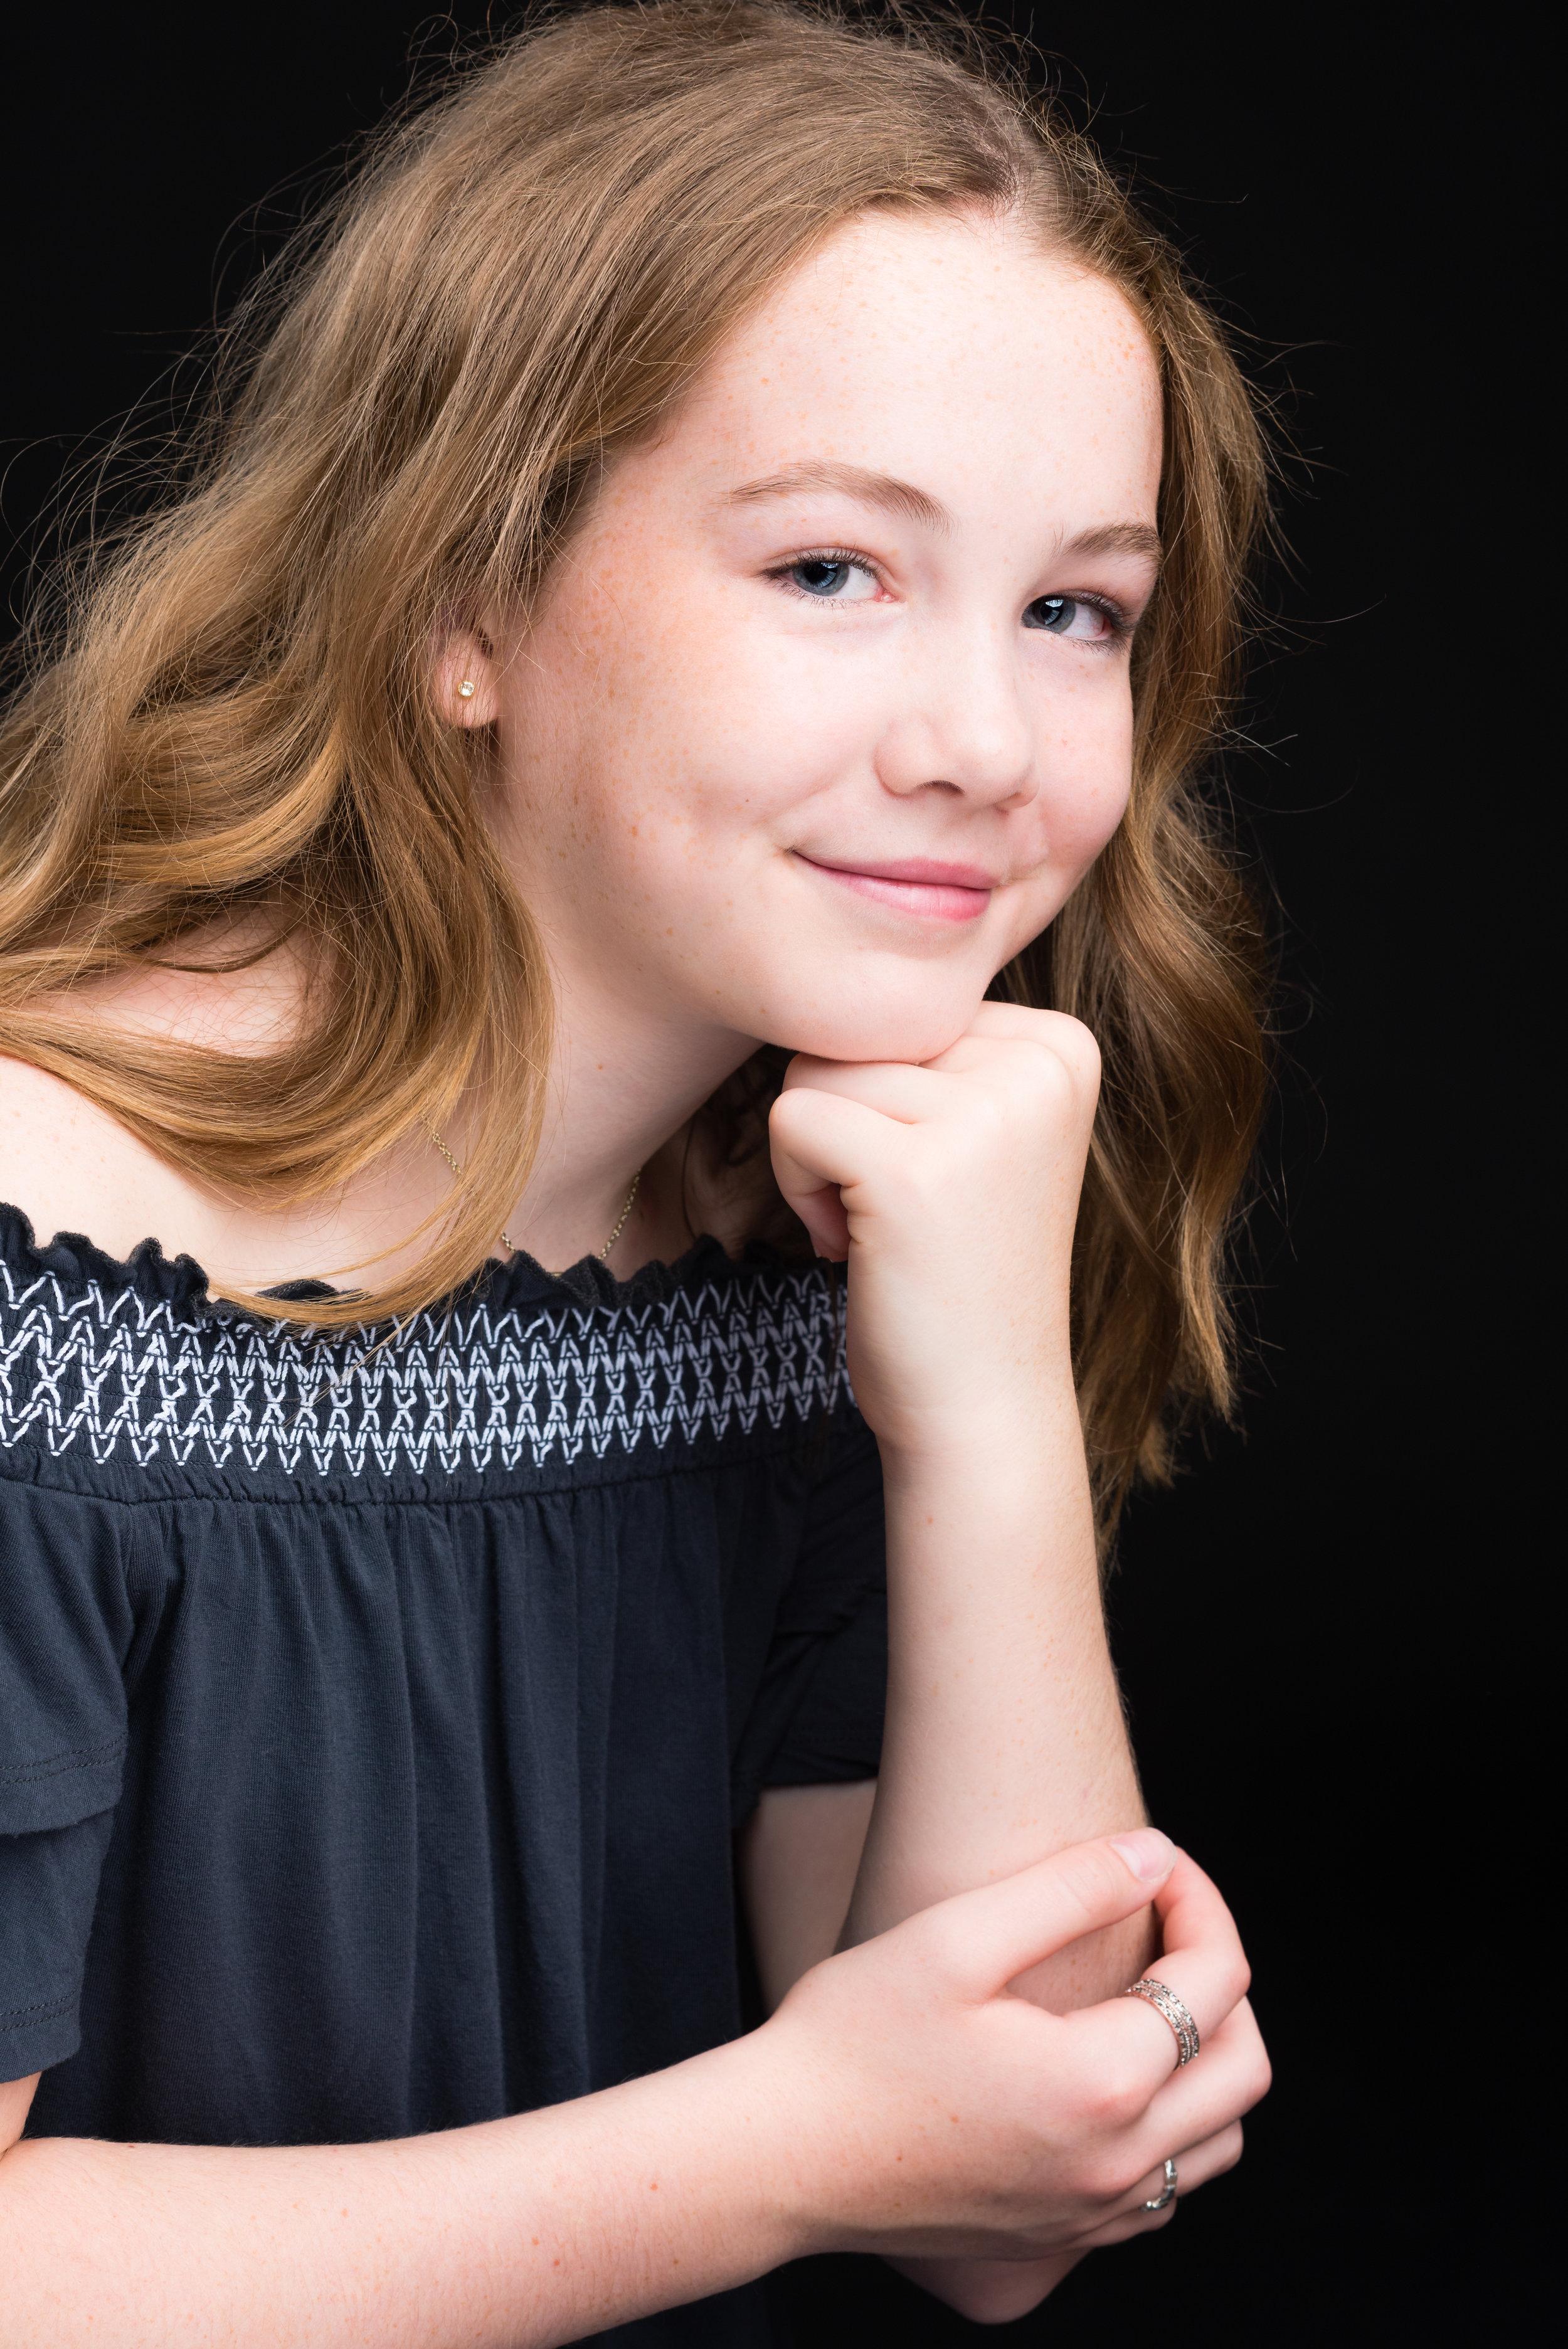 2018_September_03-Leah_Boyle_Portrait_Shoot-50703-2.jpg